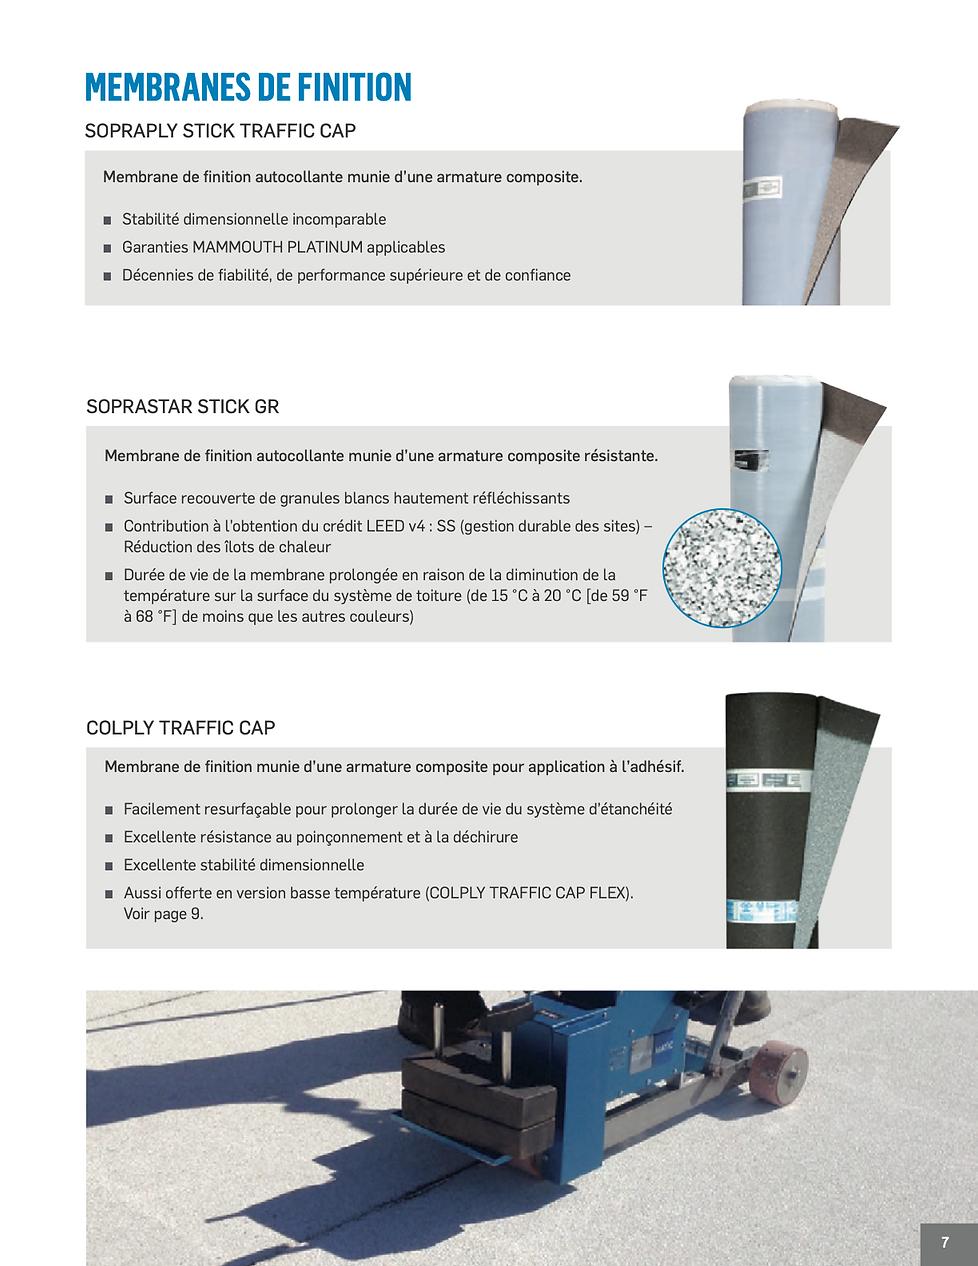 BR211-solutions-sans-flamme-soprema-fr-7